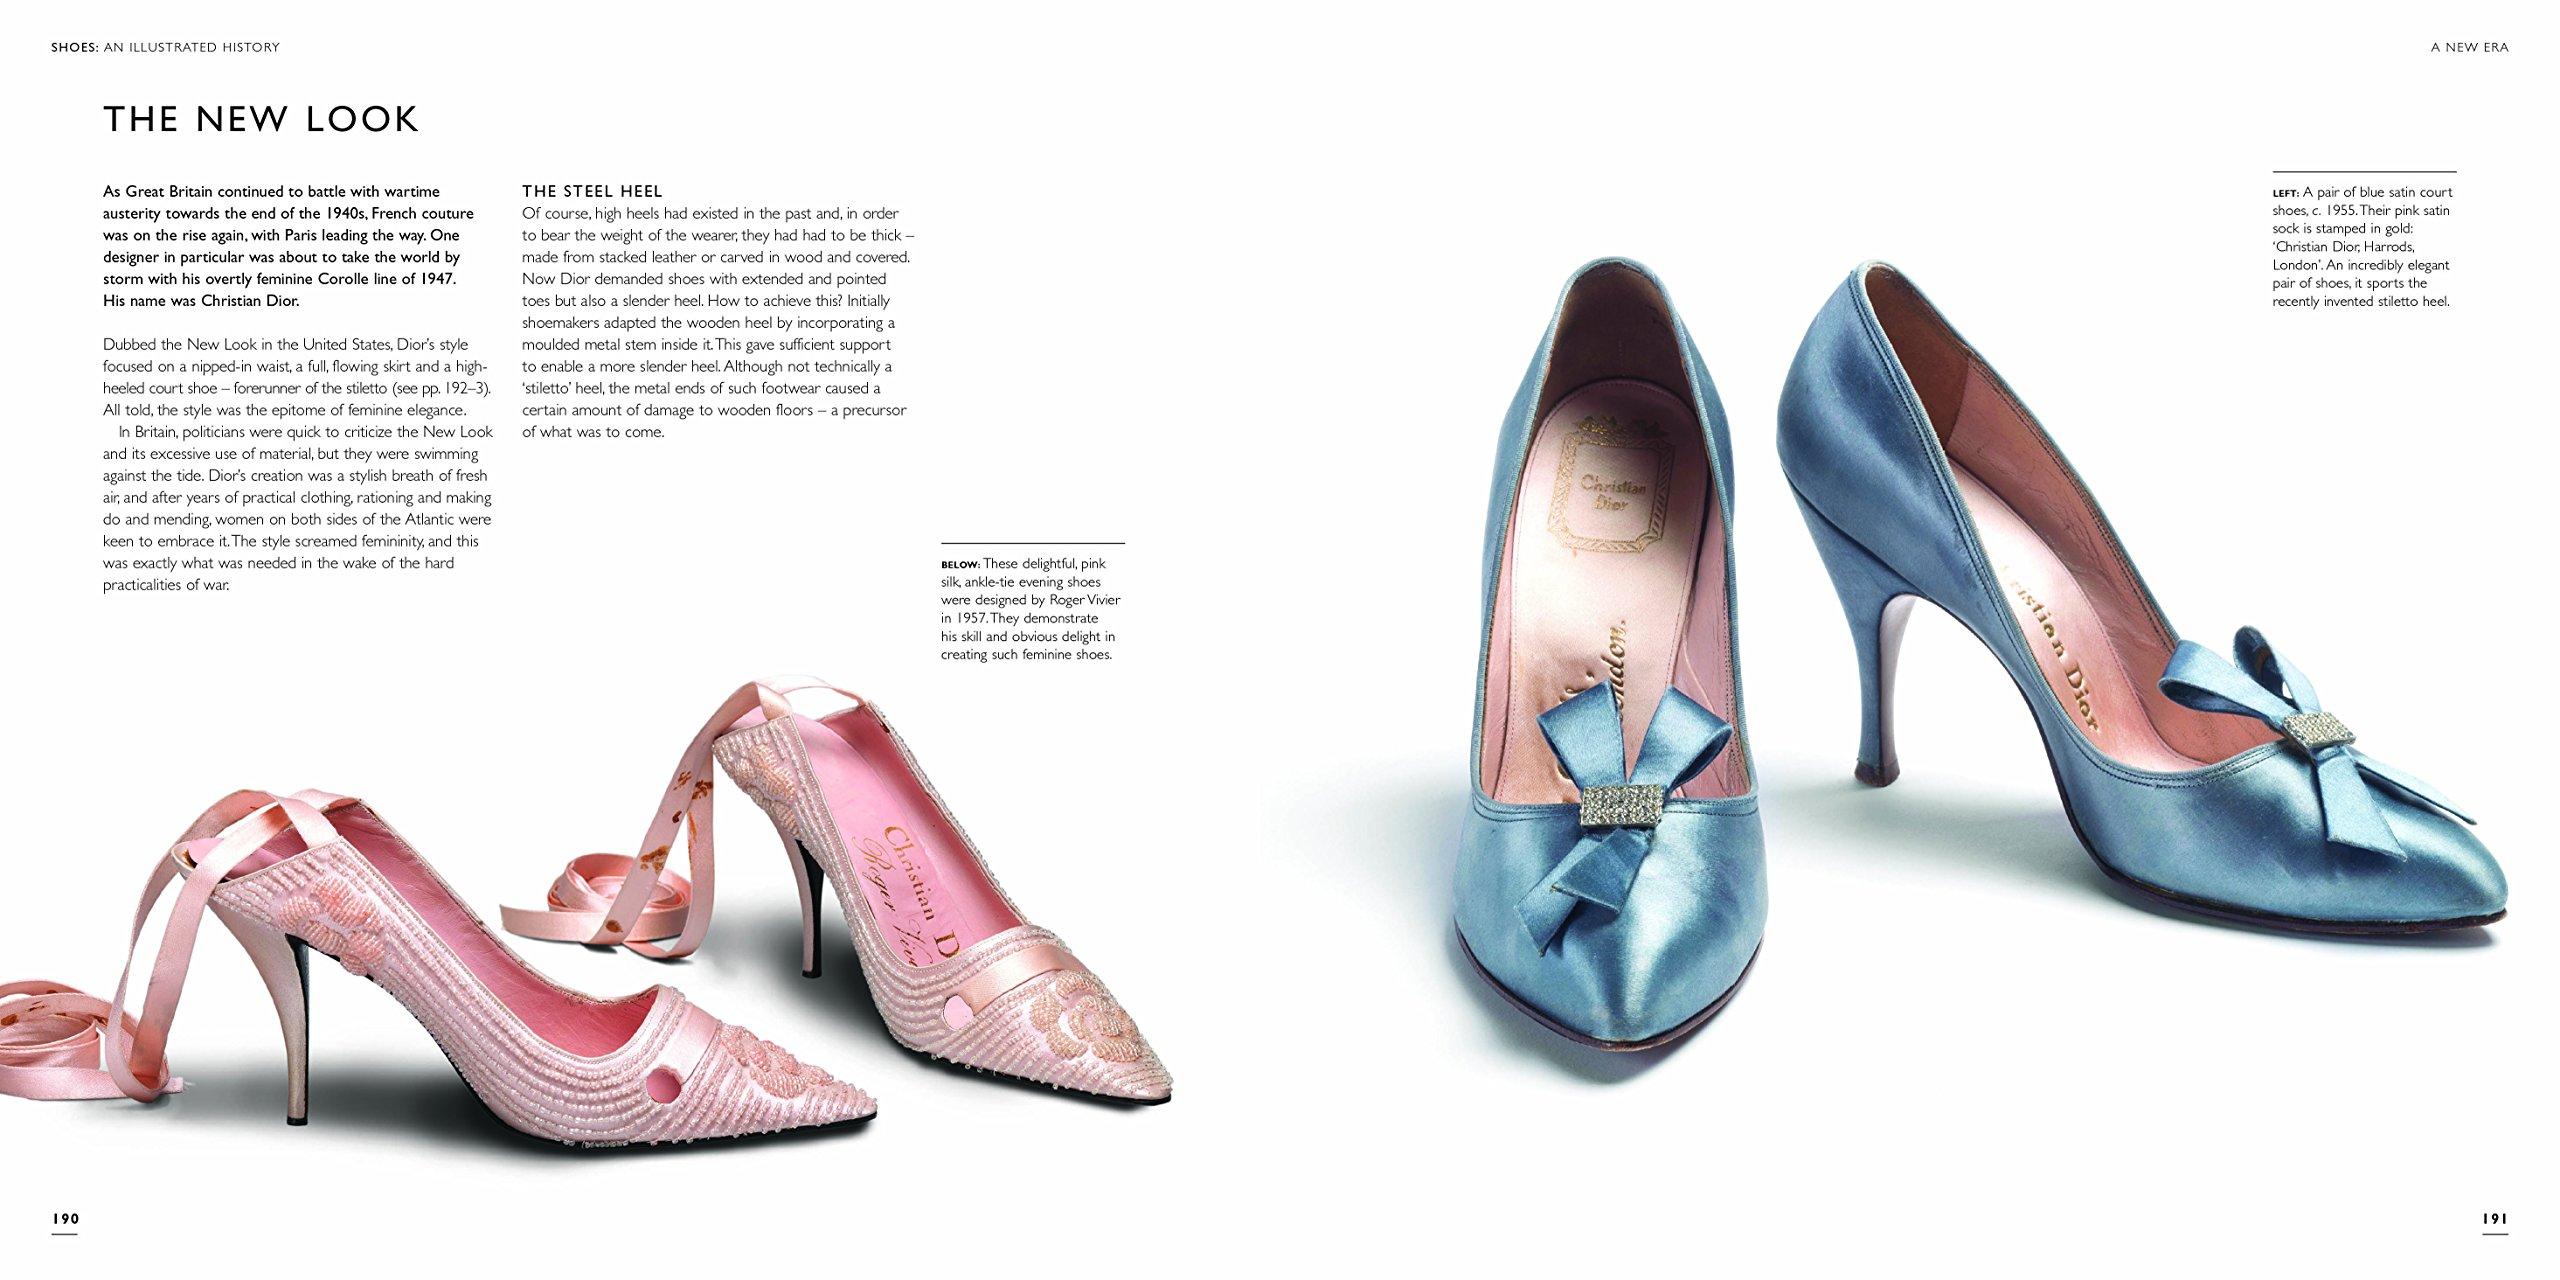 8556c1455b2518 Shoes: An Illustrated History: Amazon.co.uk: Rebecca Shawcross:  9781472531001: Books